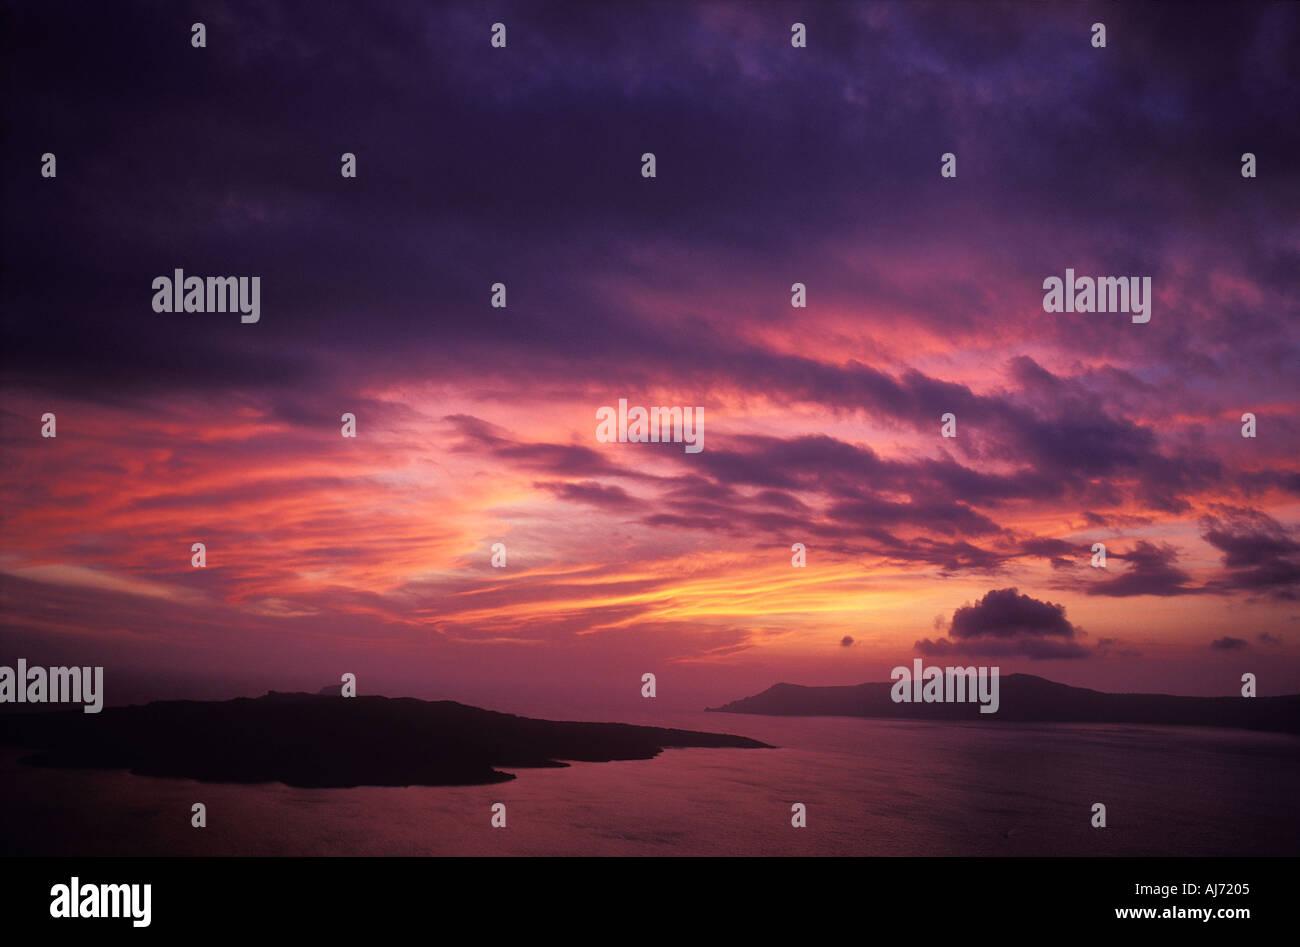 Santorin Sonnenuntergang Kykladen Griechenland Stockbild